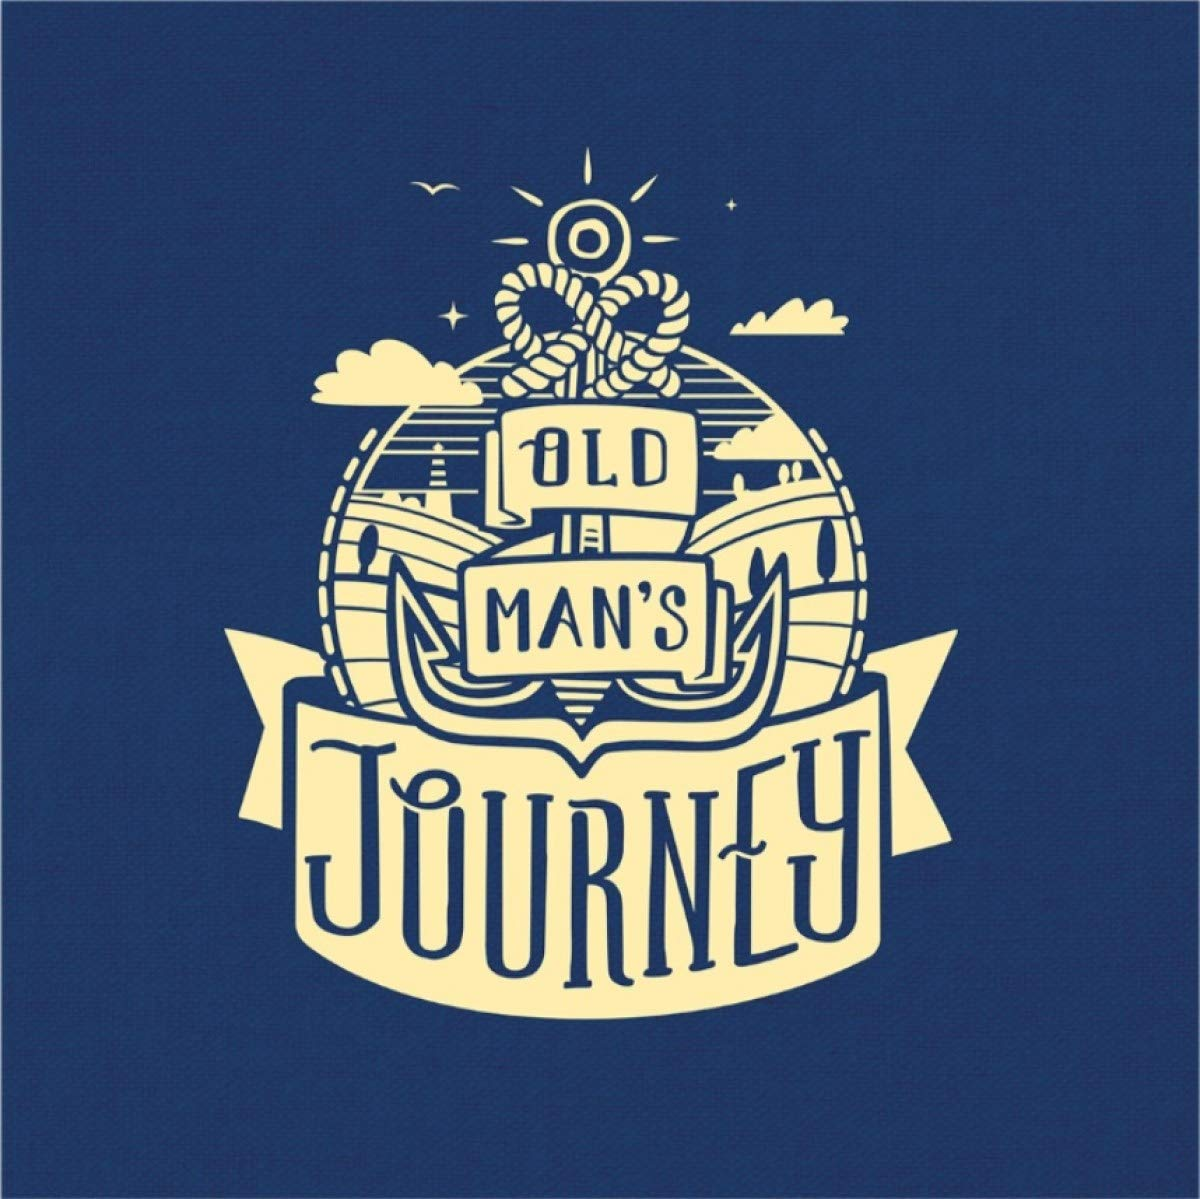 Scntfc - Old Man's Journey